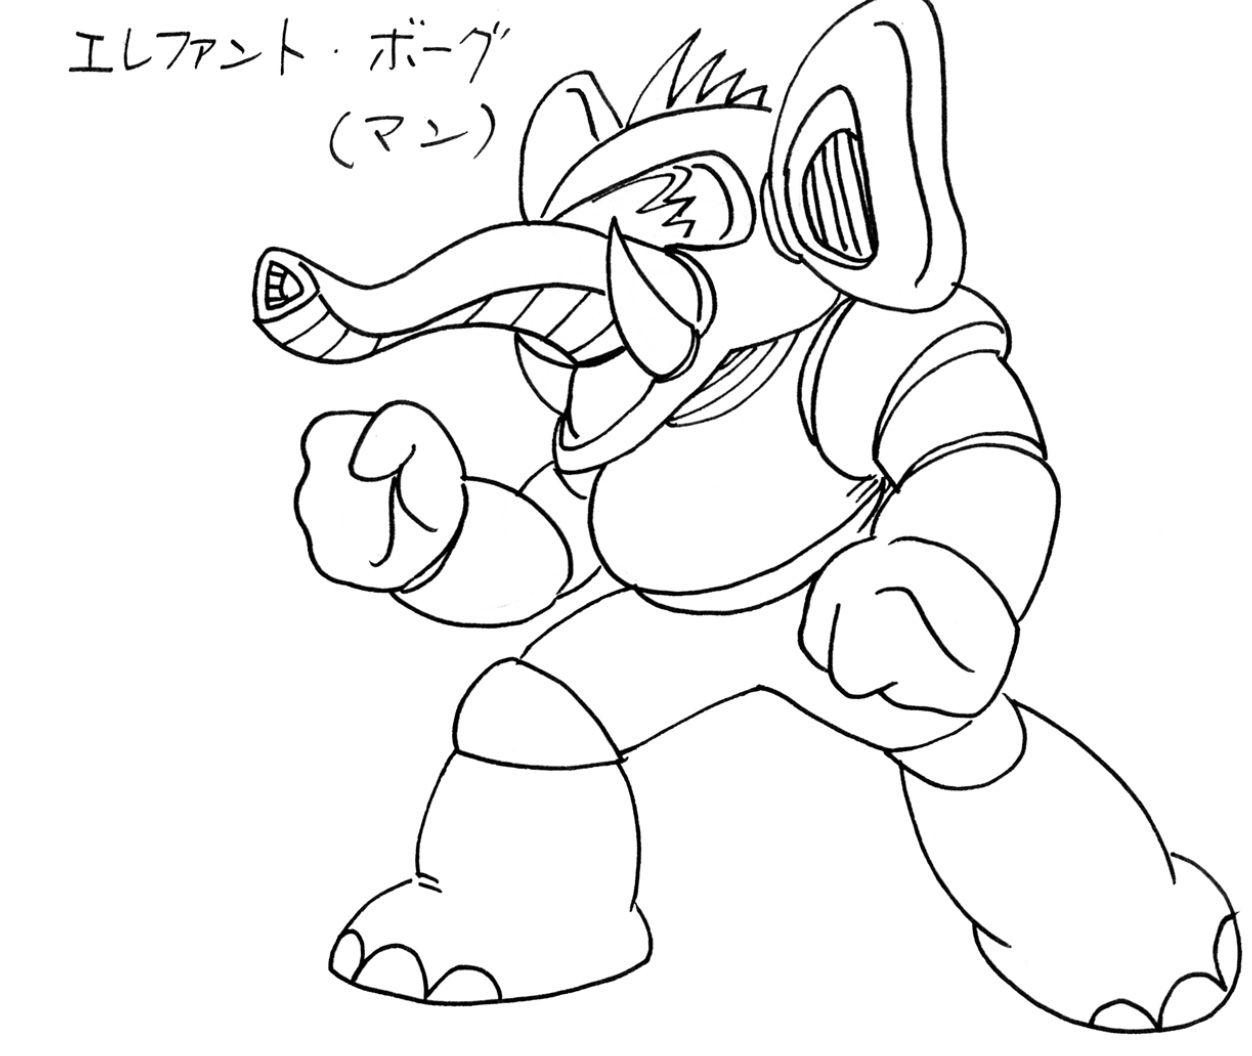 Megaman x coloring pages - Mega Man Legacy Collection Elephant Borg